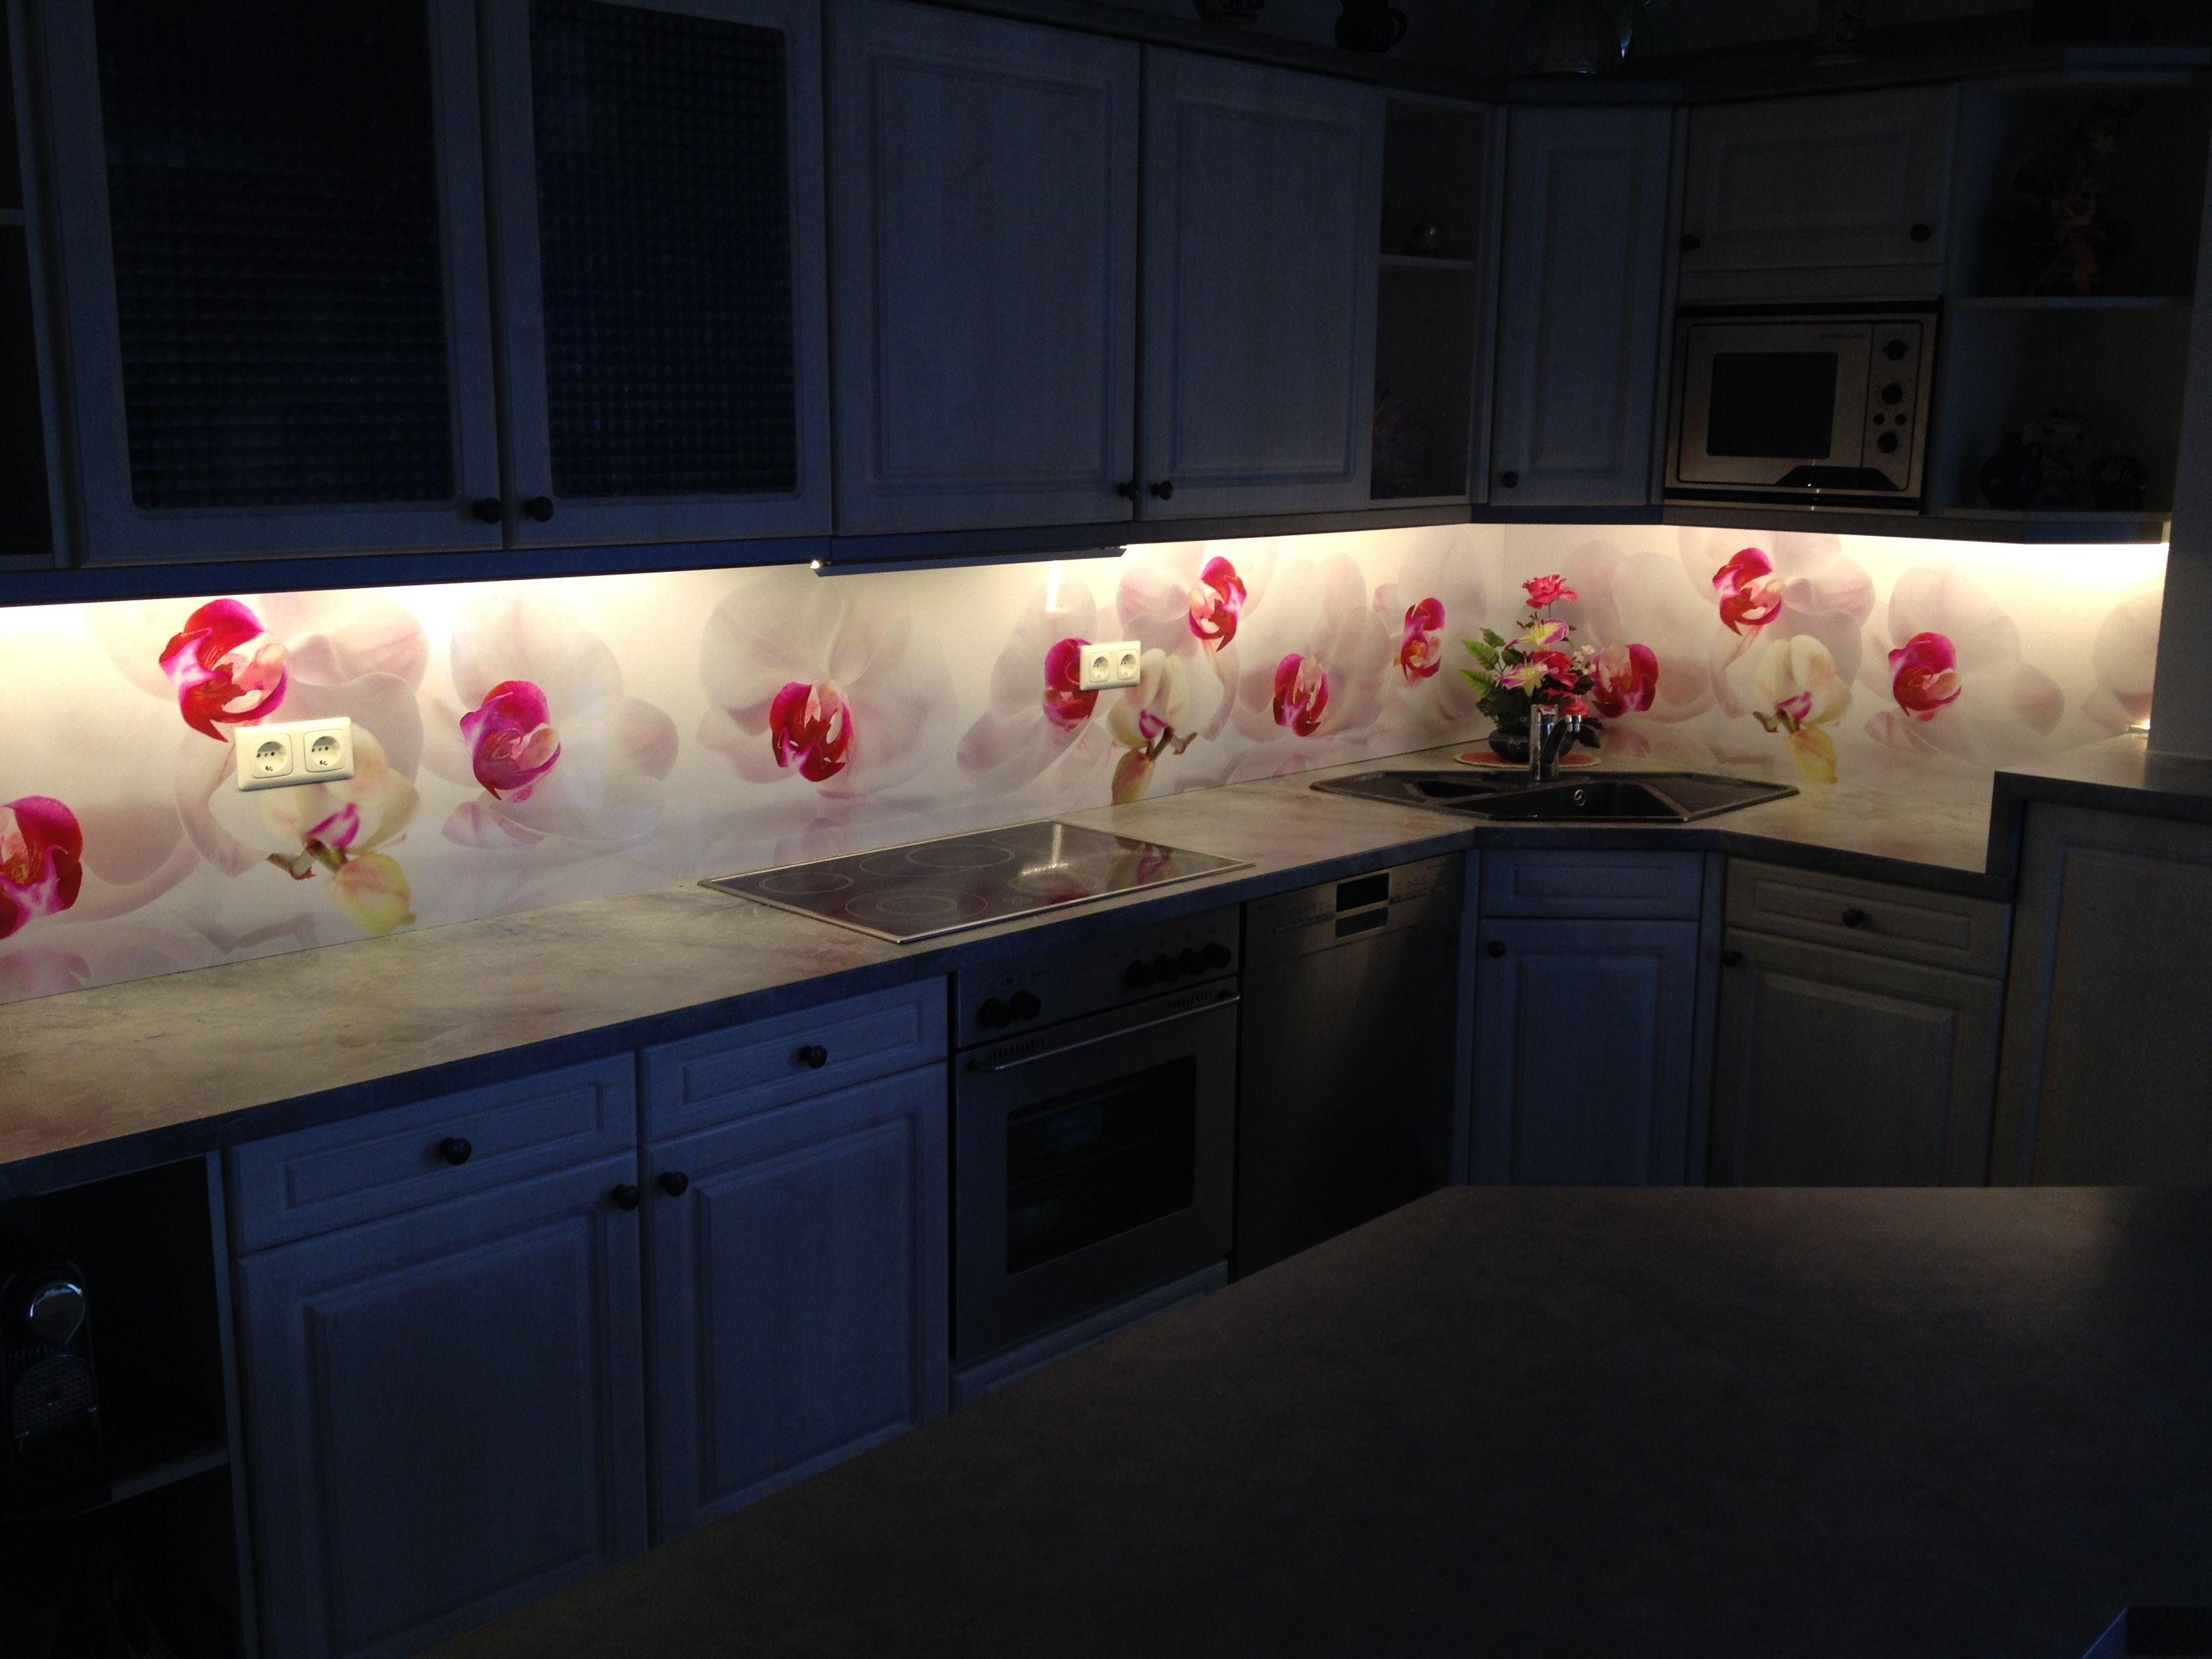 Diese Kuchenruckwand Sieht Auch Mit Beleuchtung Richtig Gut Aus Kuechenrueckwand Duschrueckwand Schoenundwieder Kuchen Ruckwand Kuche Kuche Umgestalten